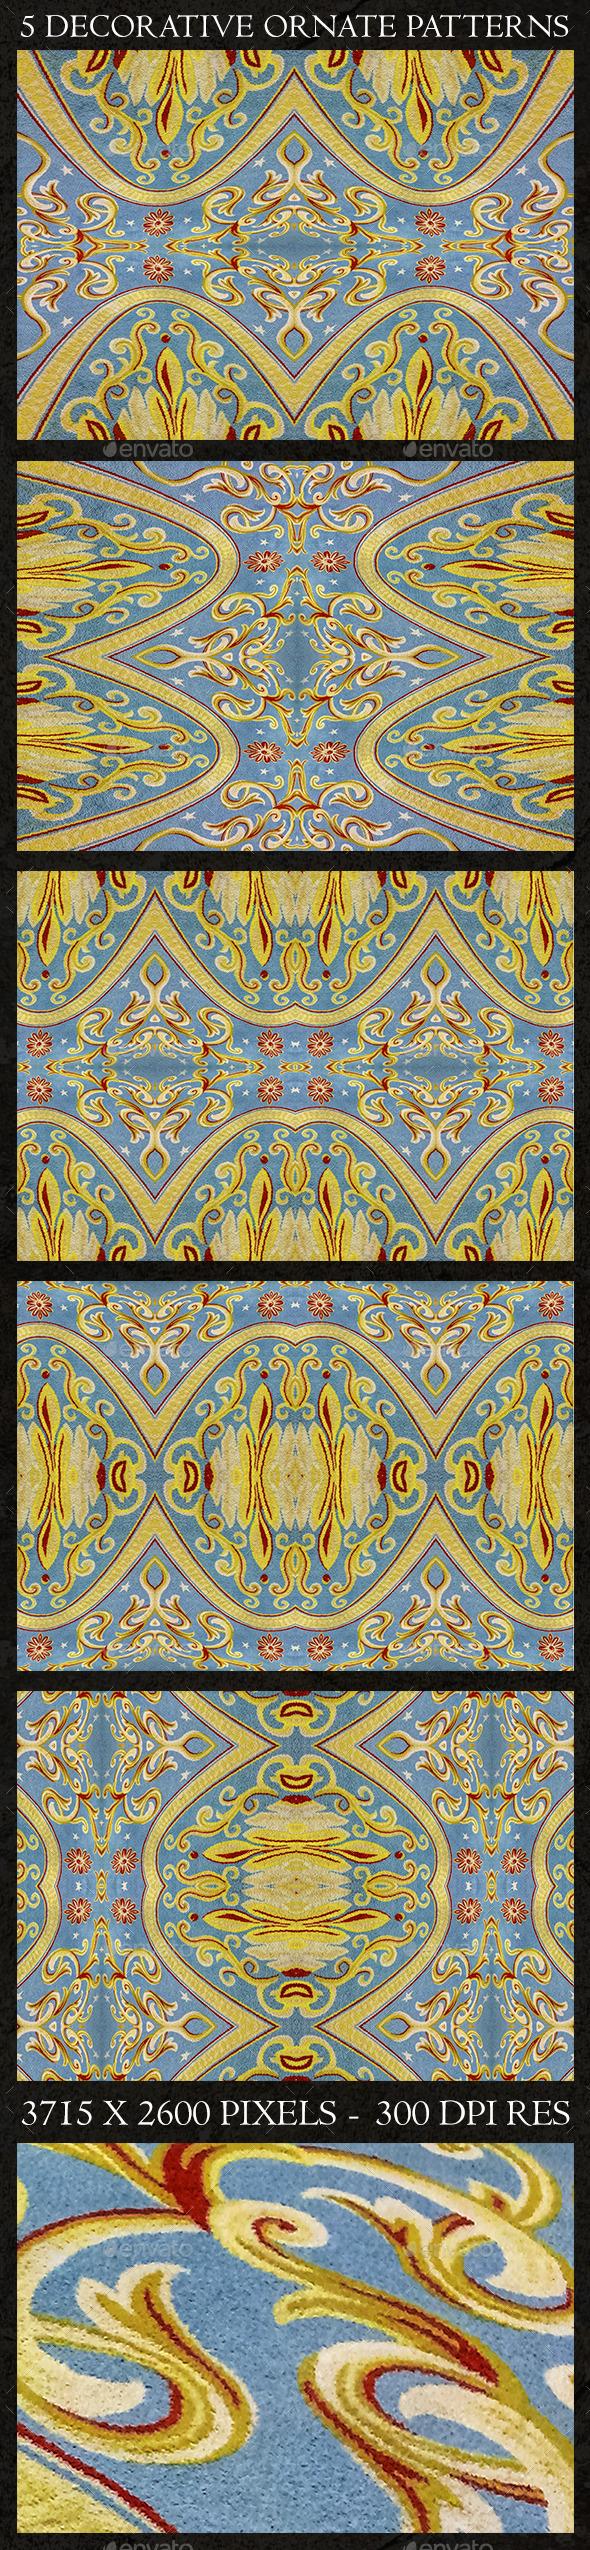 5 Decorative Ornate Patterns - Decorative Graphics